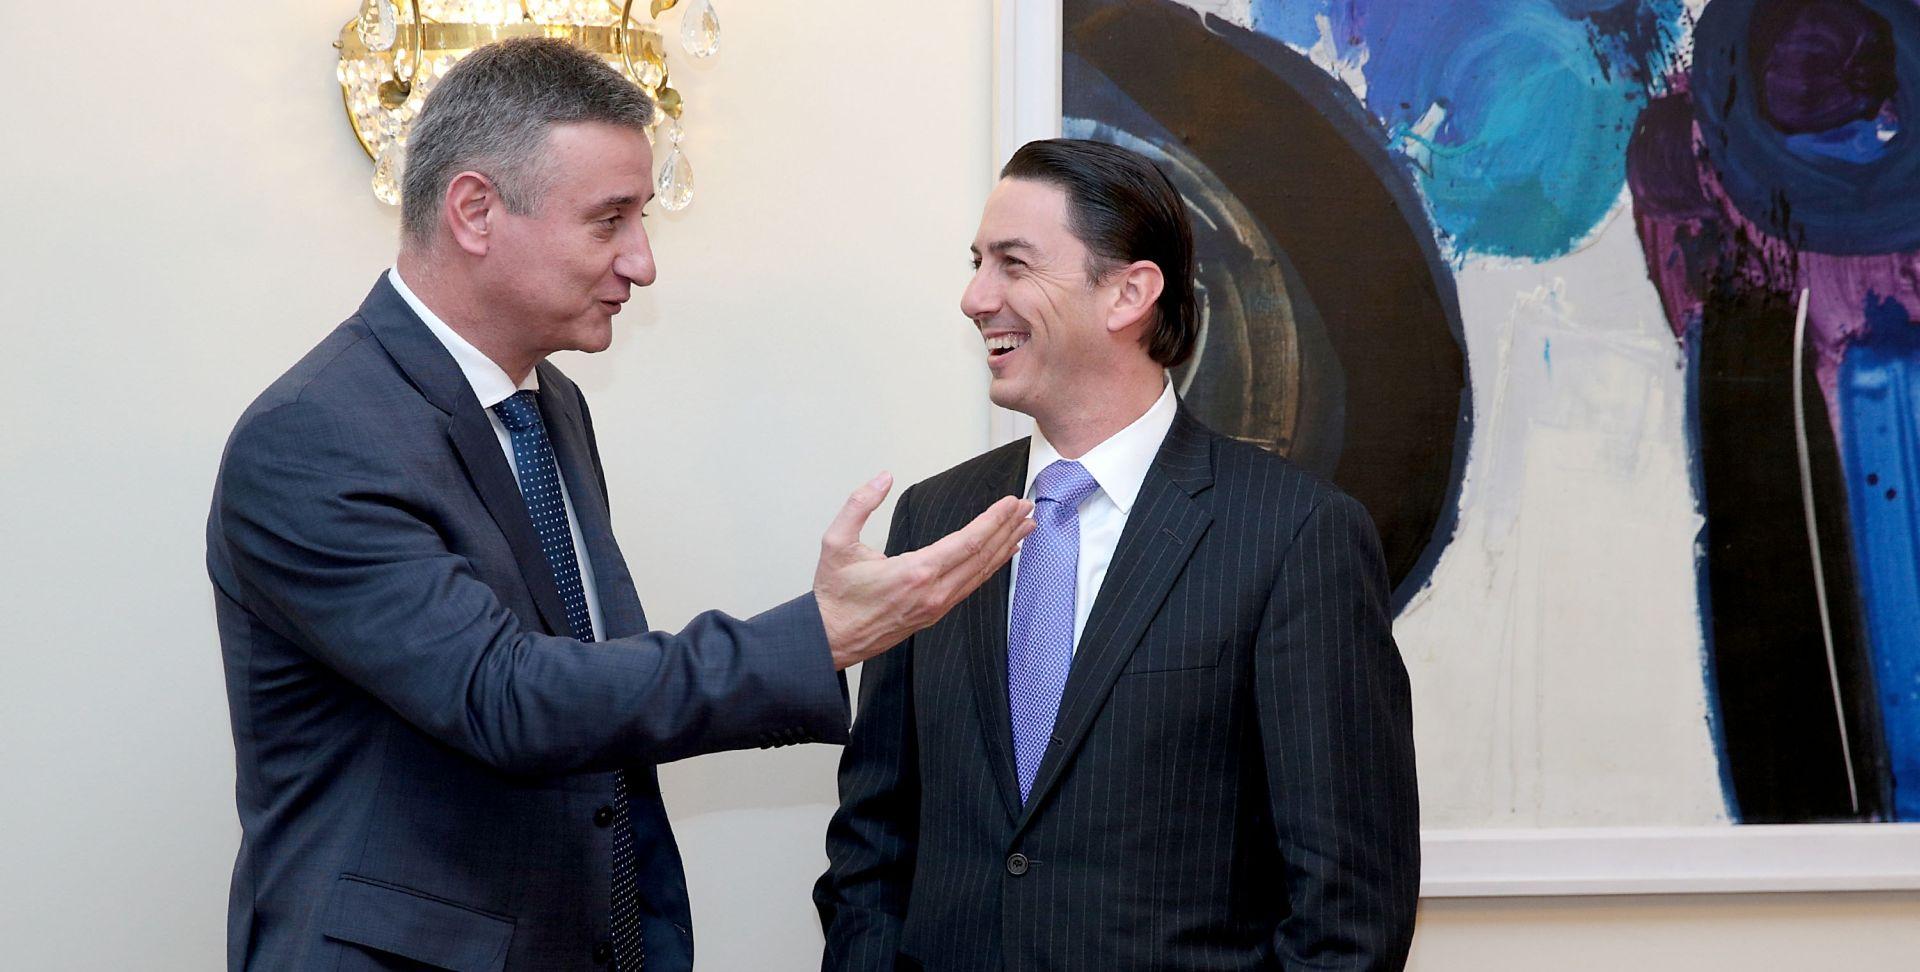 Amos Hochstein u Zagrebu ponovno lobirao za izgradnju LNG terminala na Krku